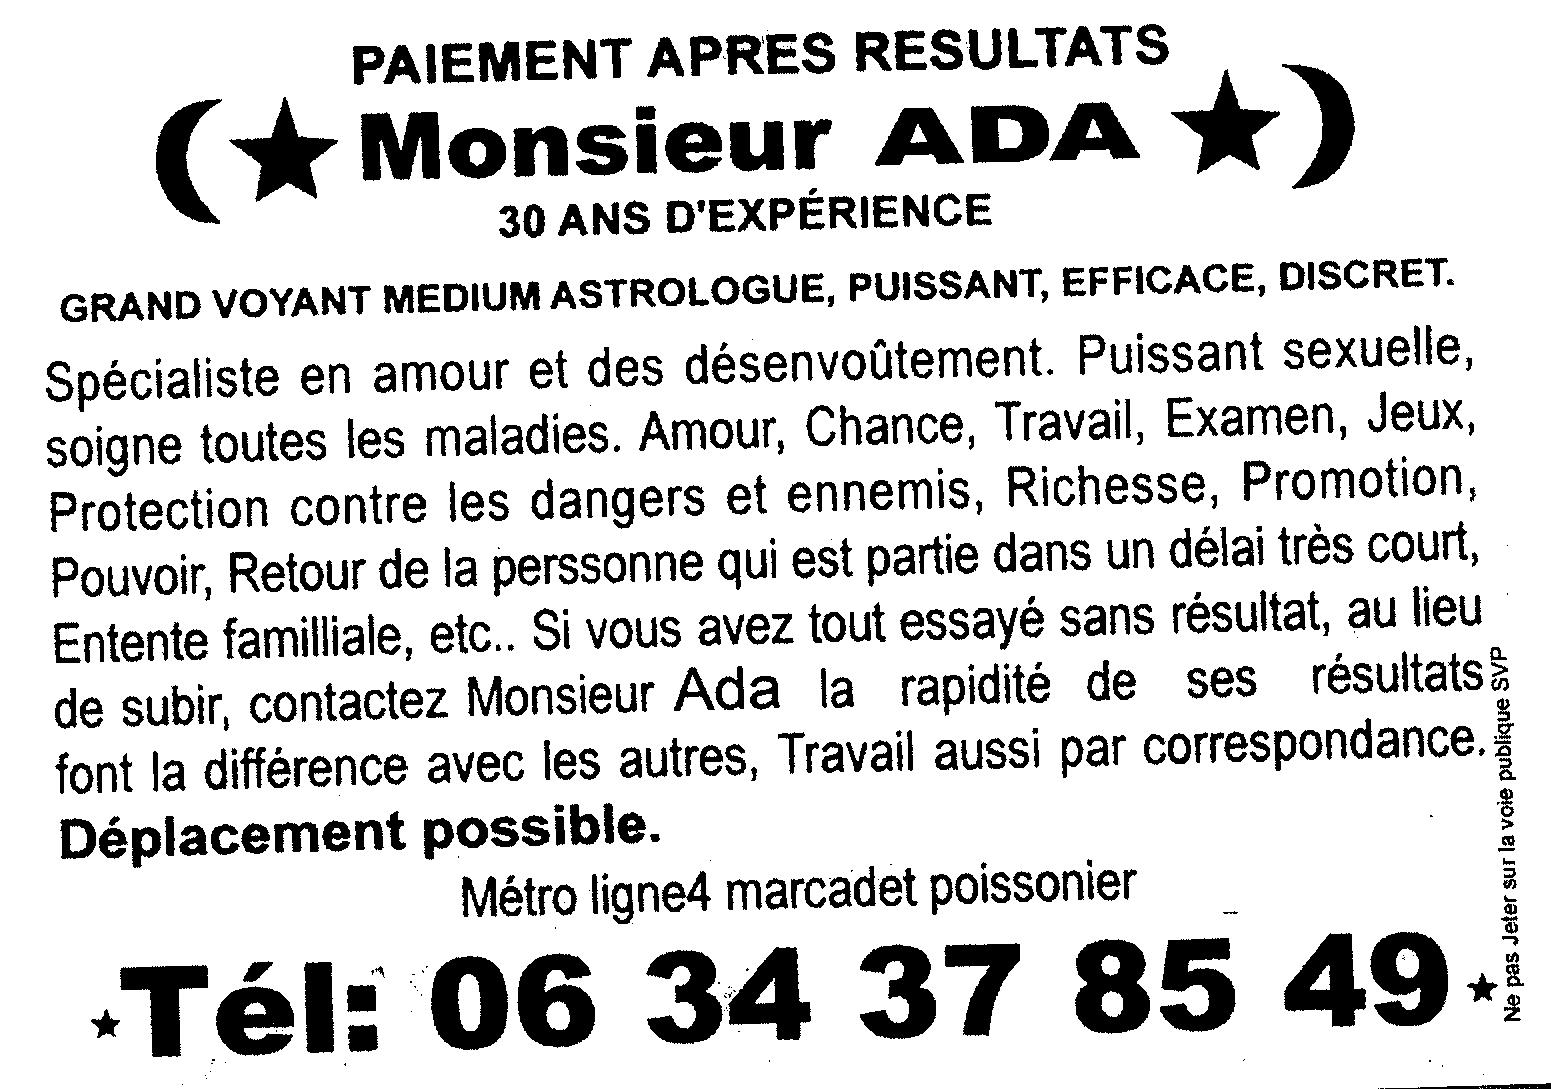 Monsieur ADA